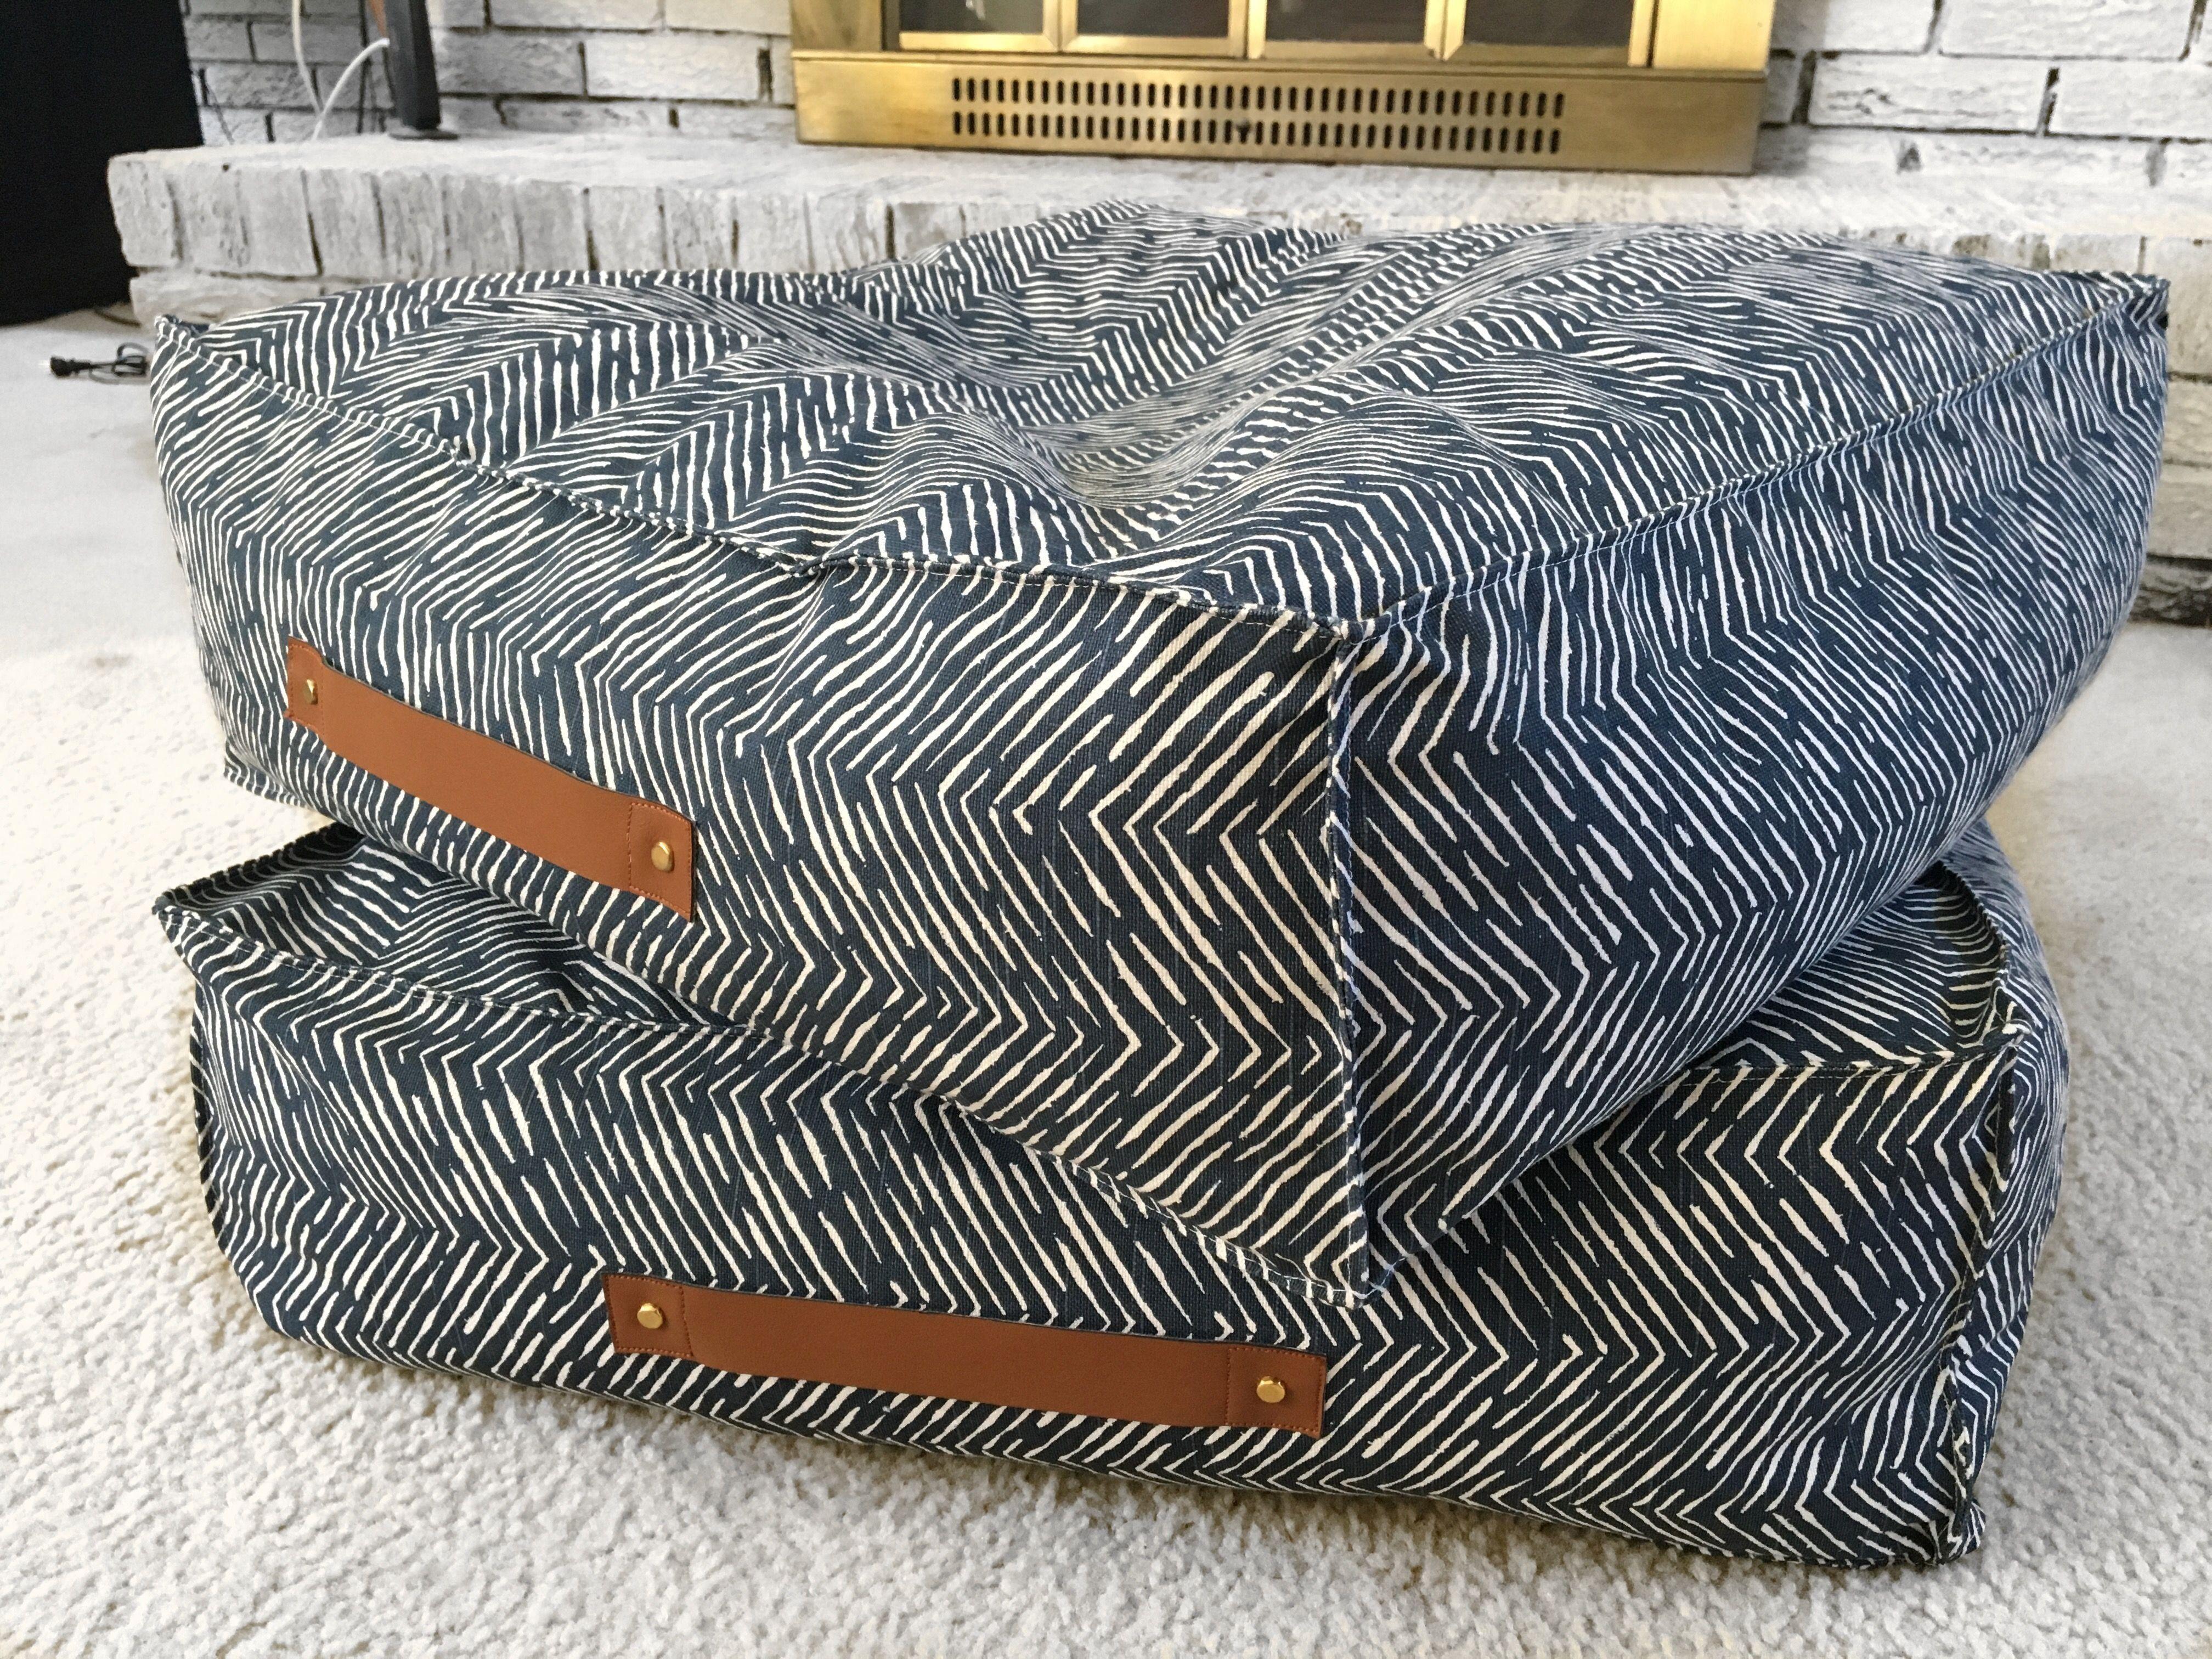 Cuscini Giganti Per Bambini.Diy Large Floor Pillows Cuscini Pavimenti E Fai Da Te